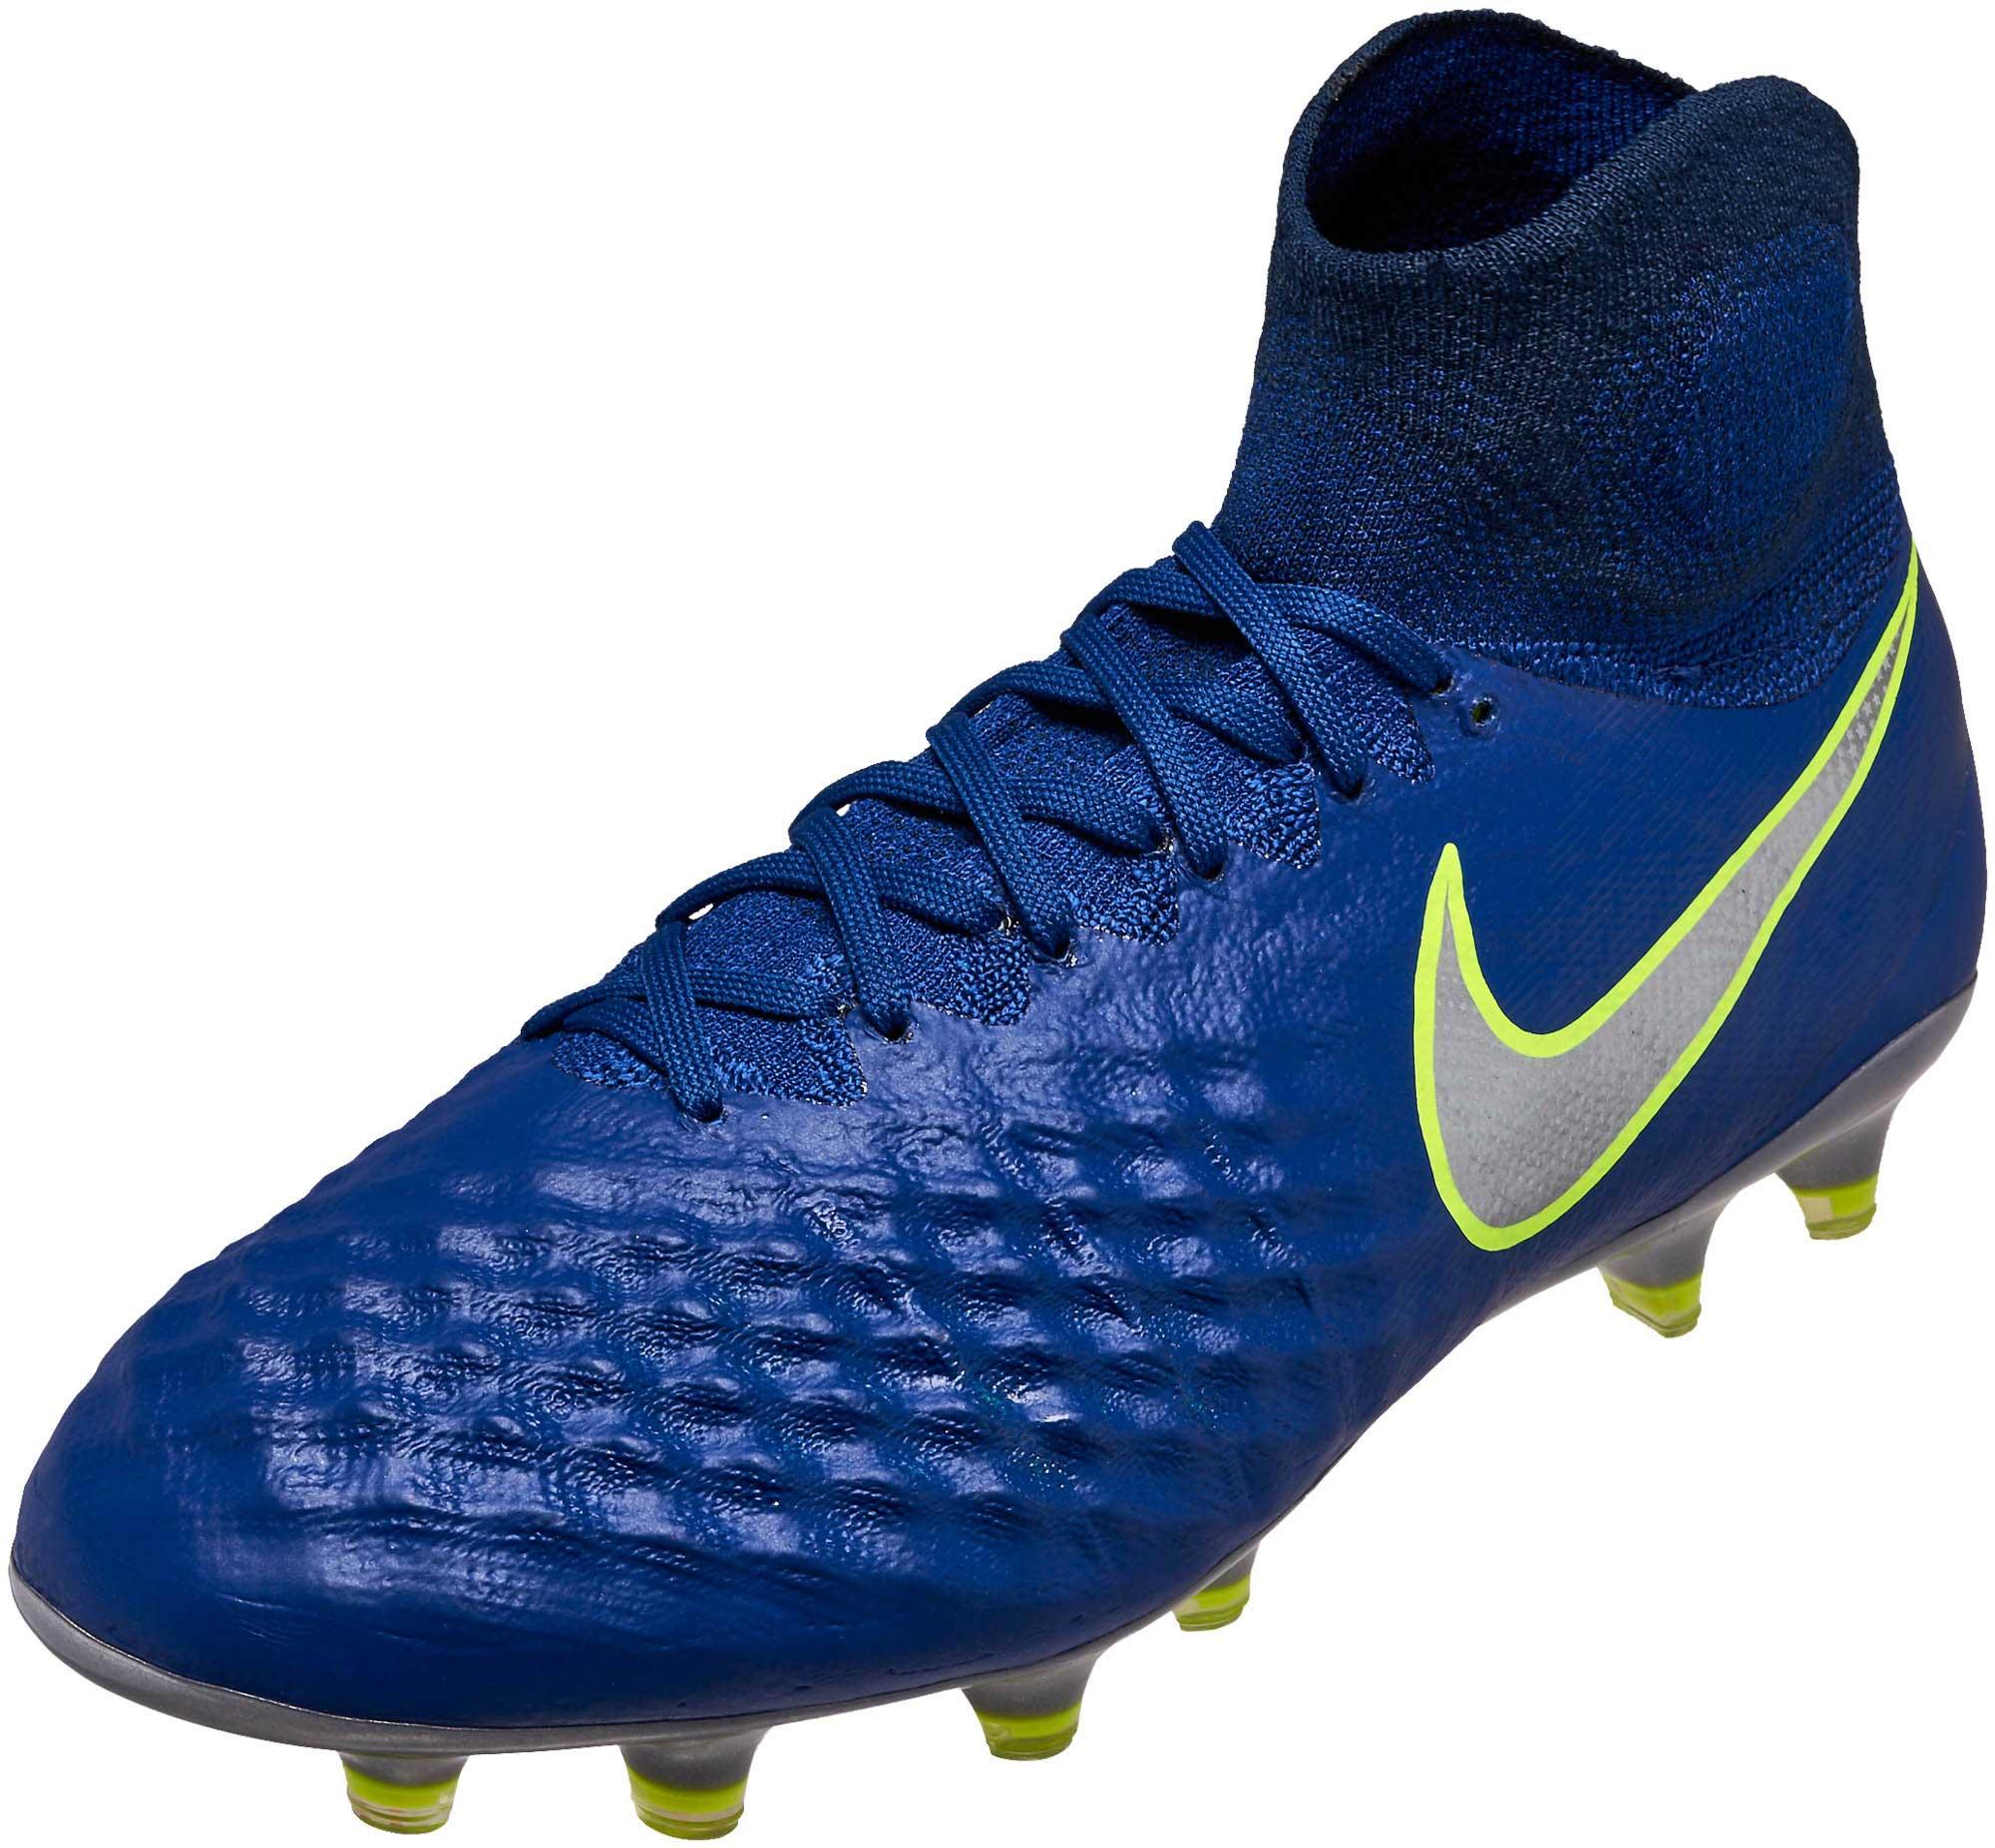 Nike Magista Obra II FG - Deep Royal Magista Soccer Cleats b63085d4f5019